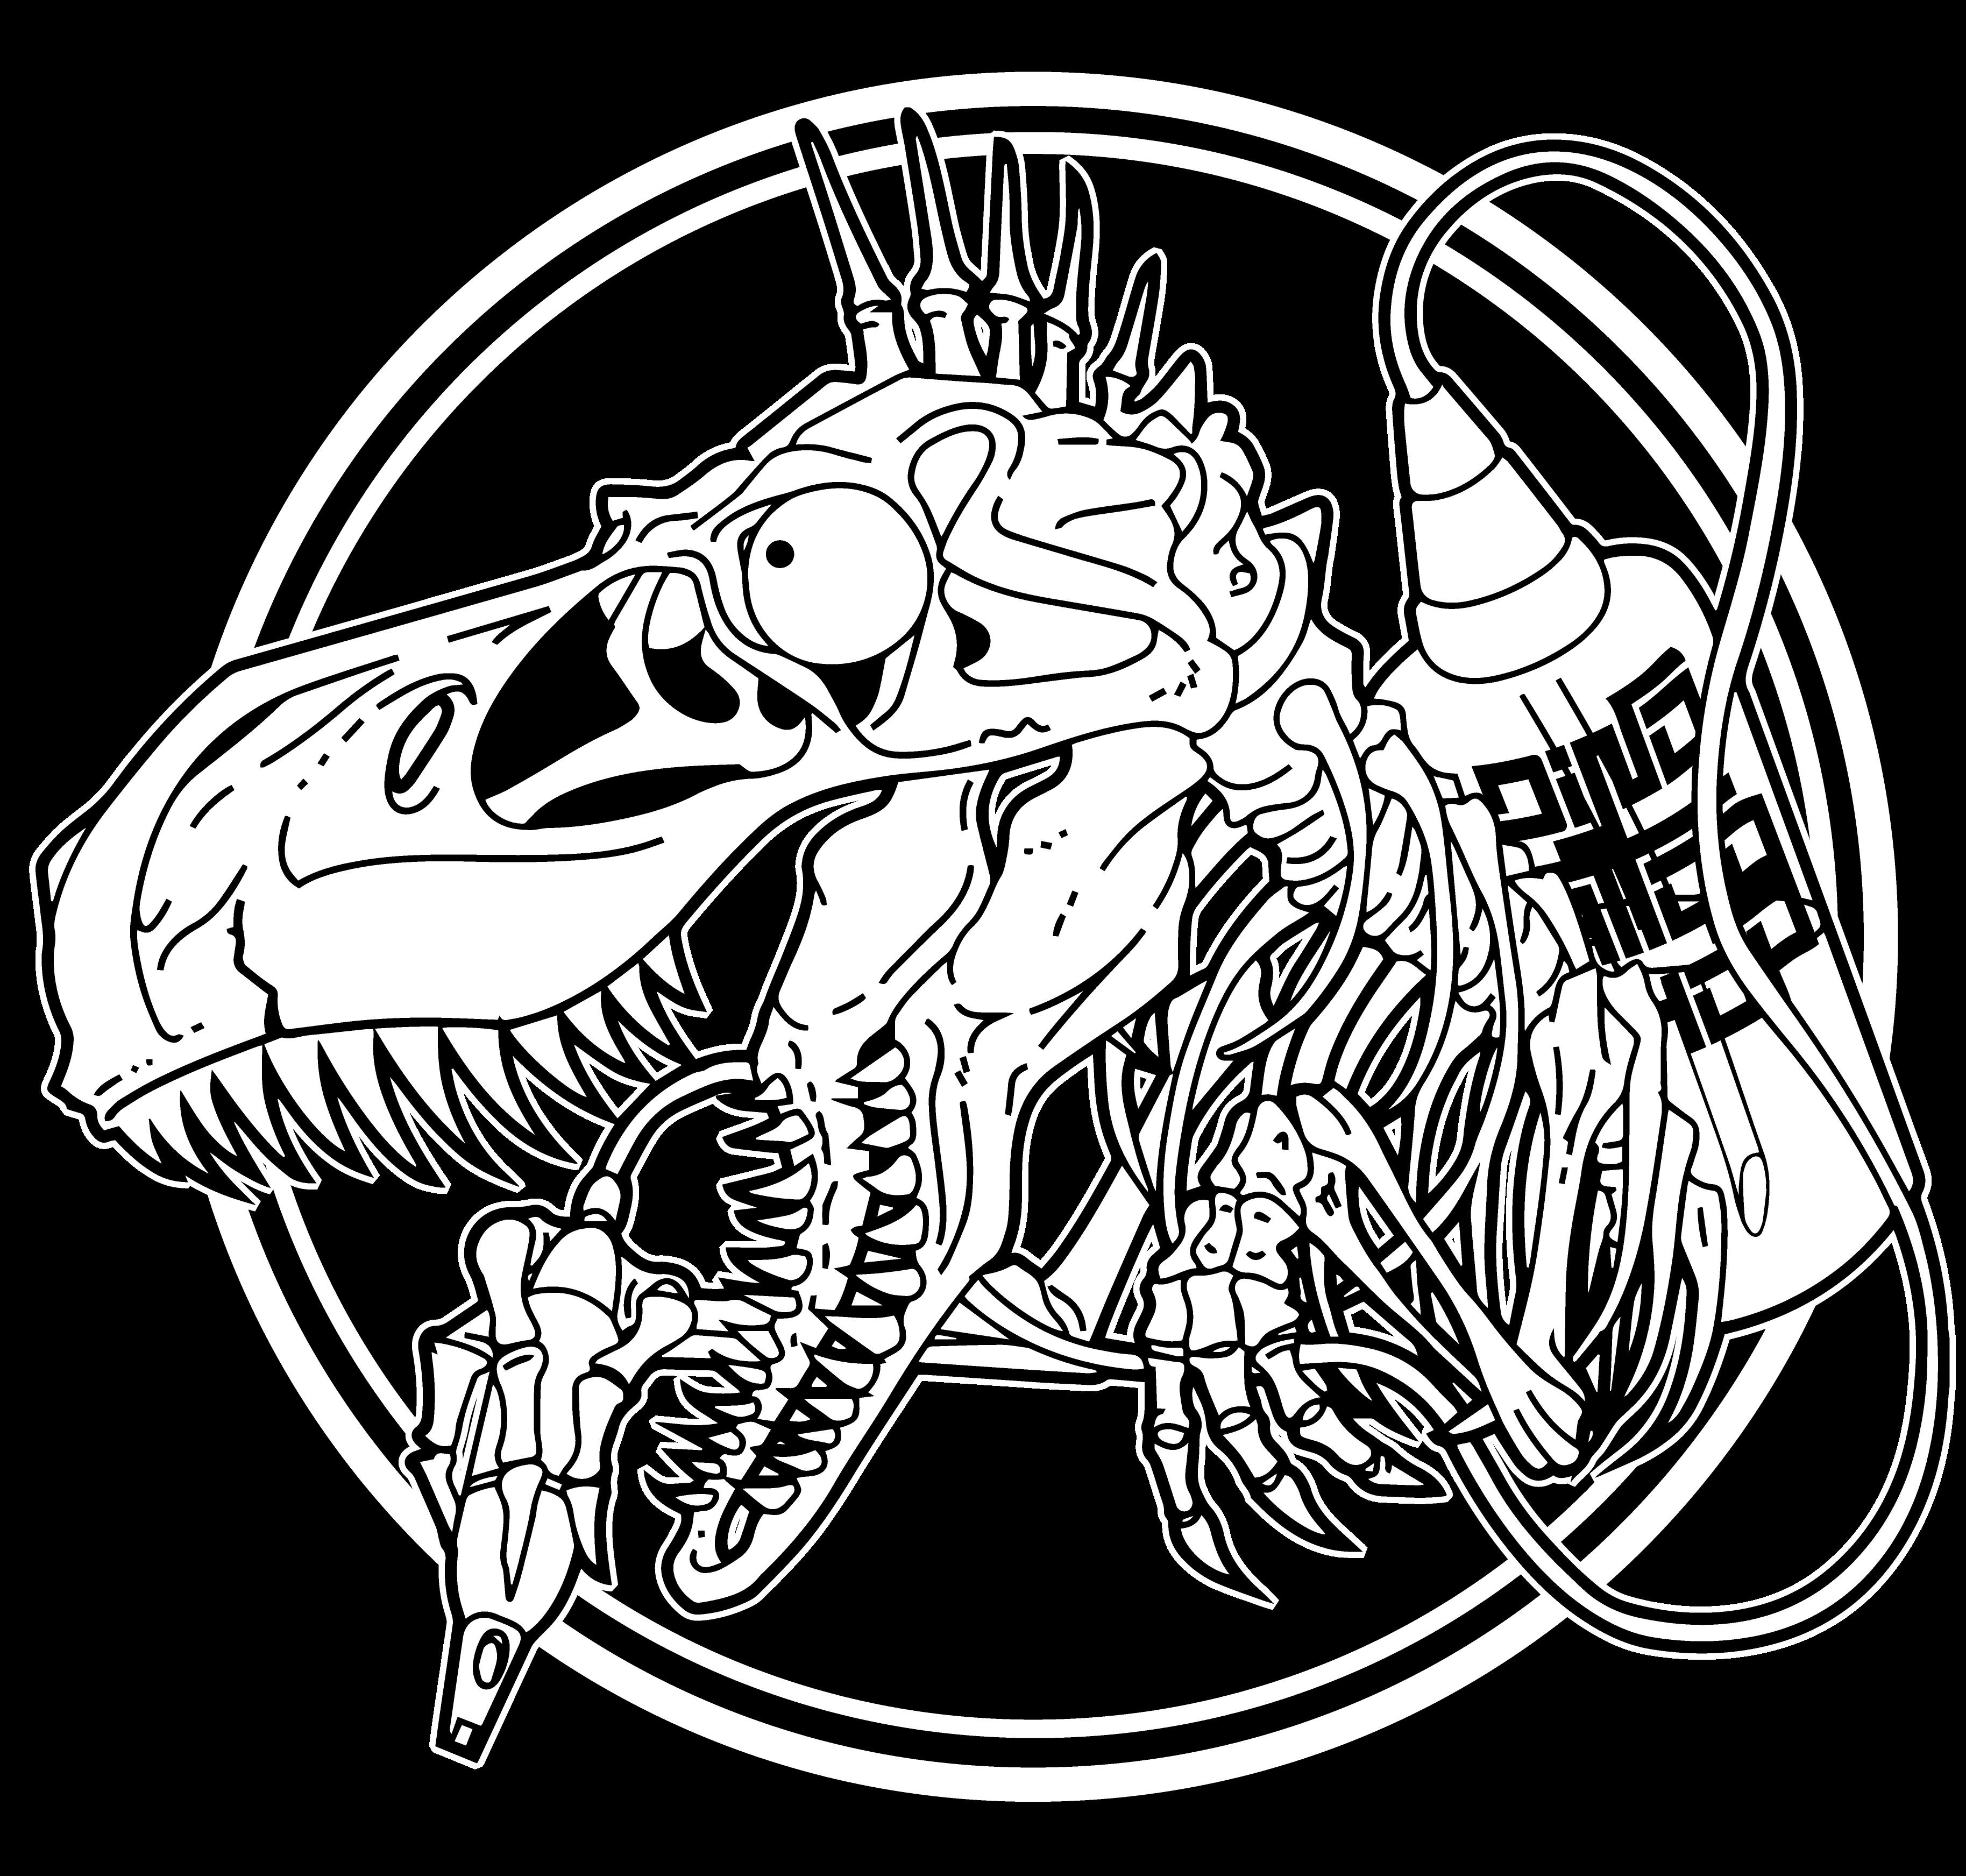 DinoTattooShop